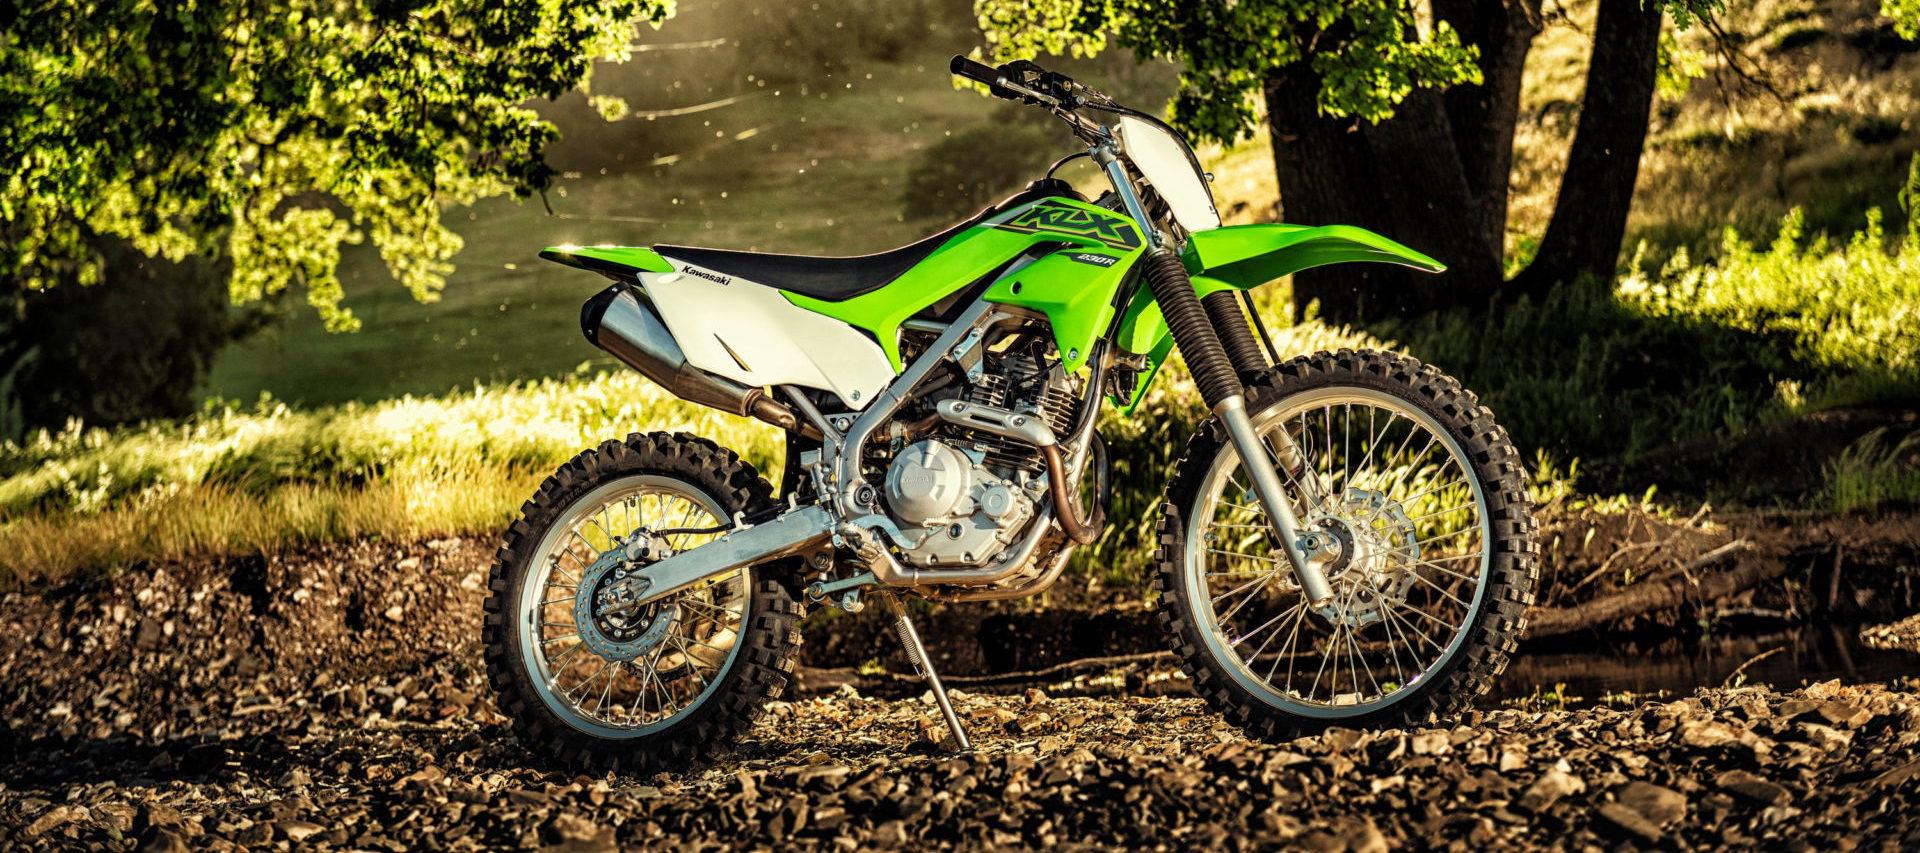 Kawasaki Announces 2021 KLX Off-Road And KX Mini Motocross Models ...